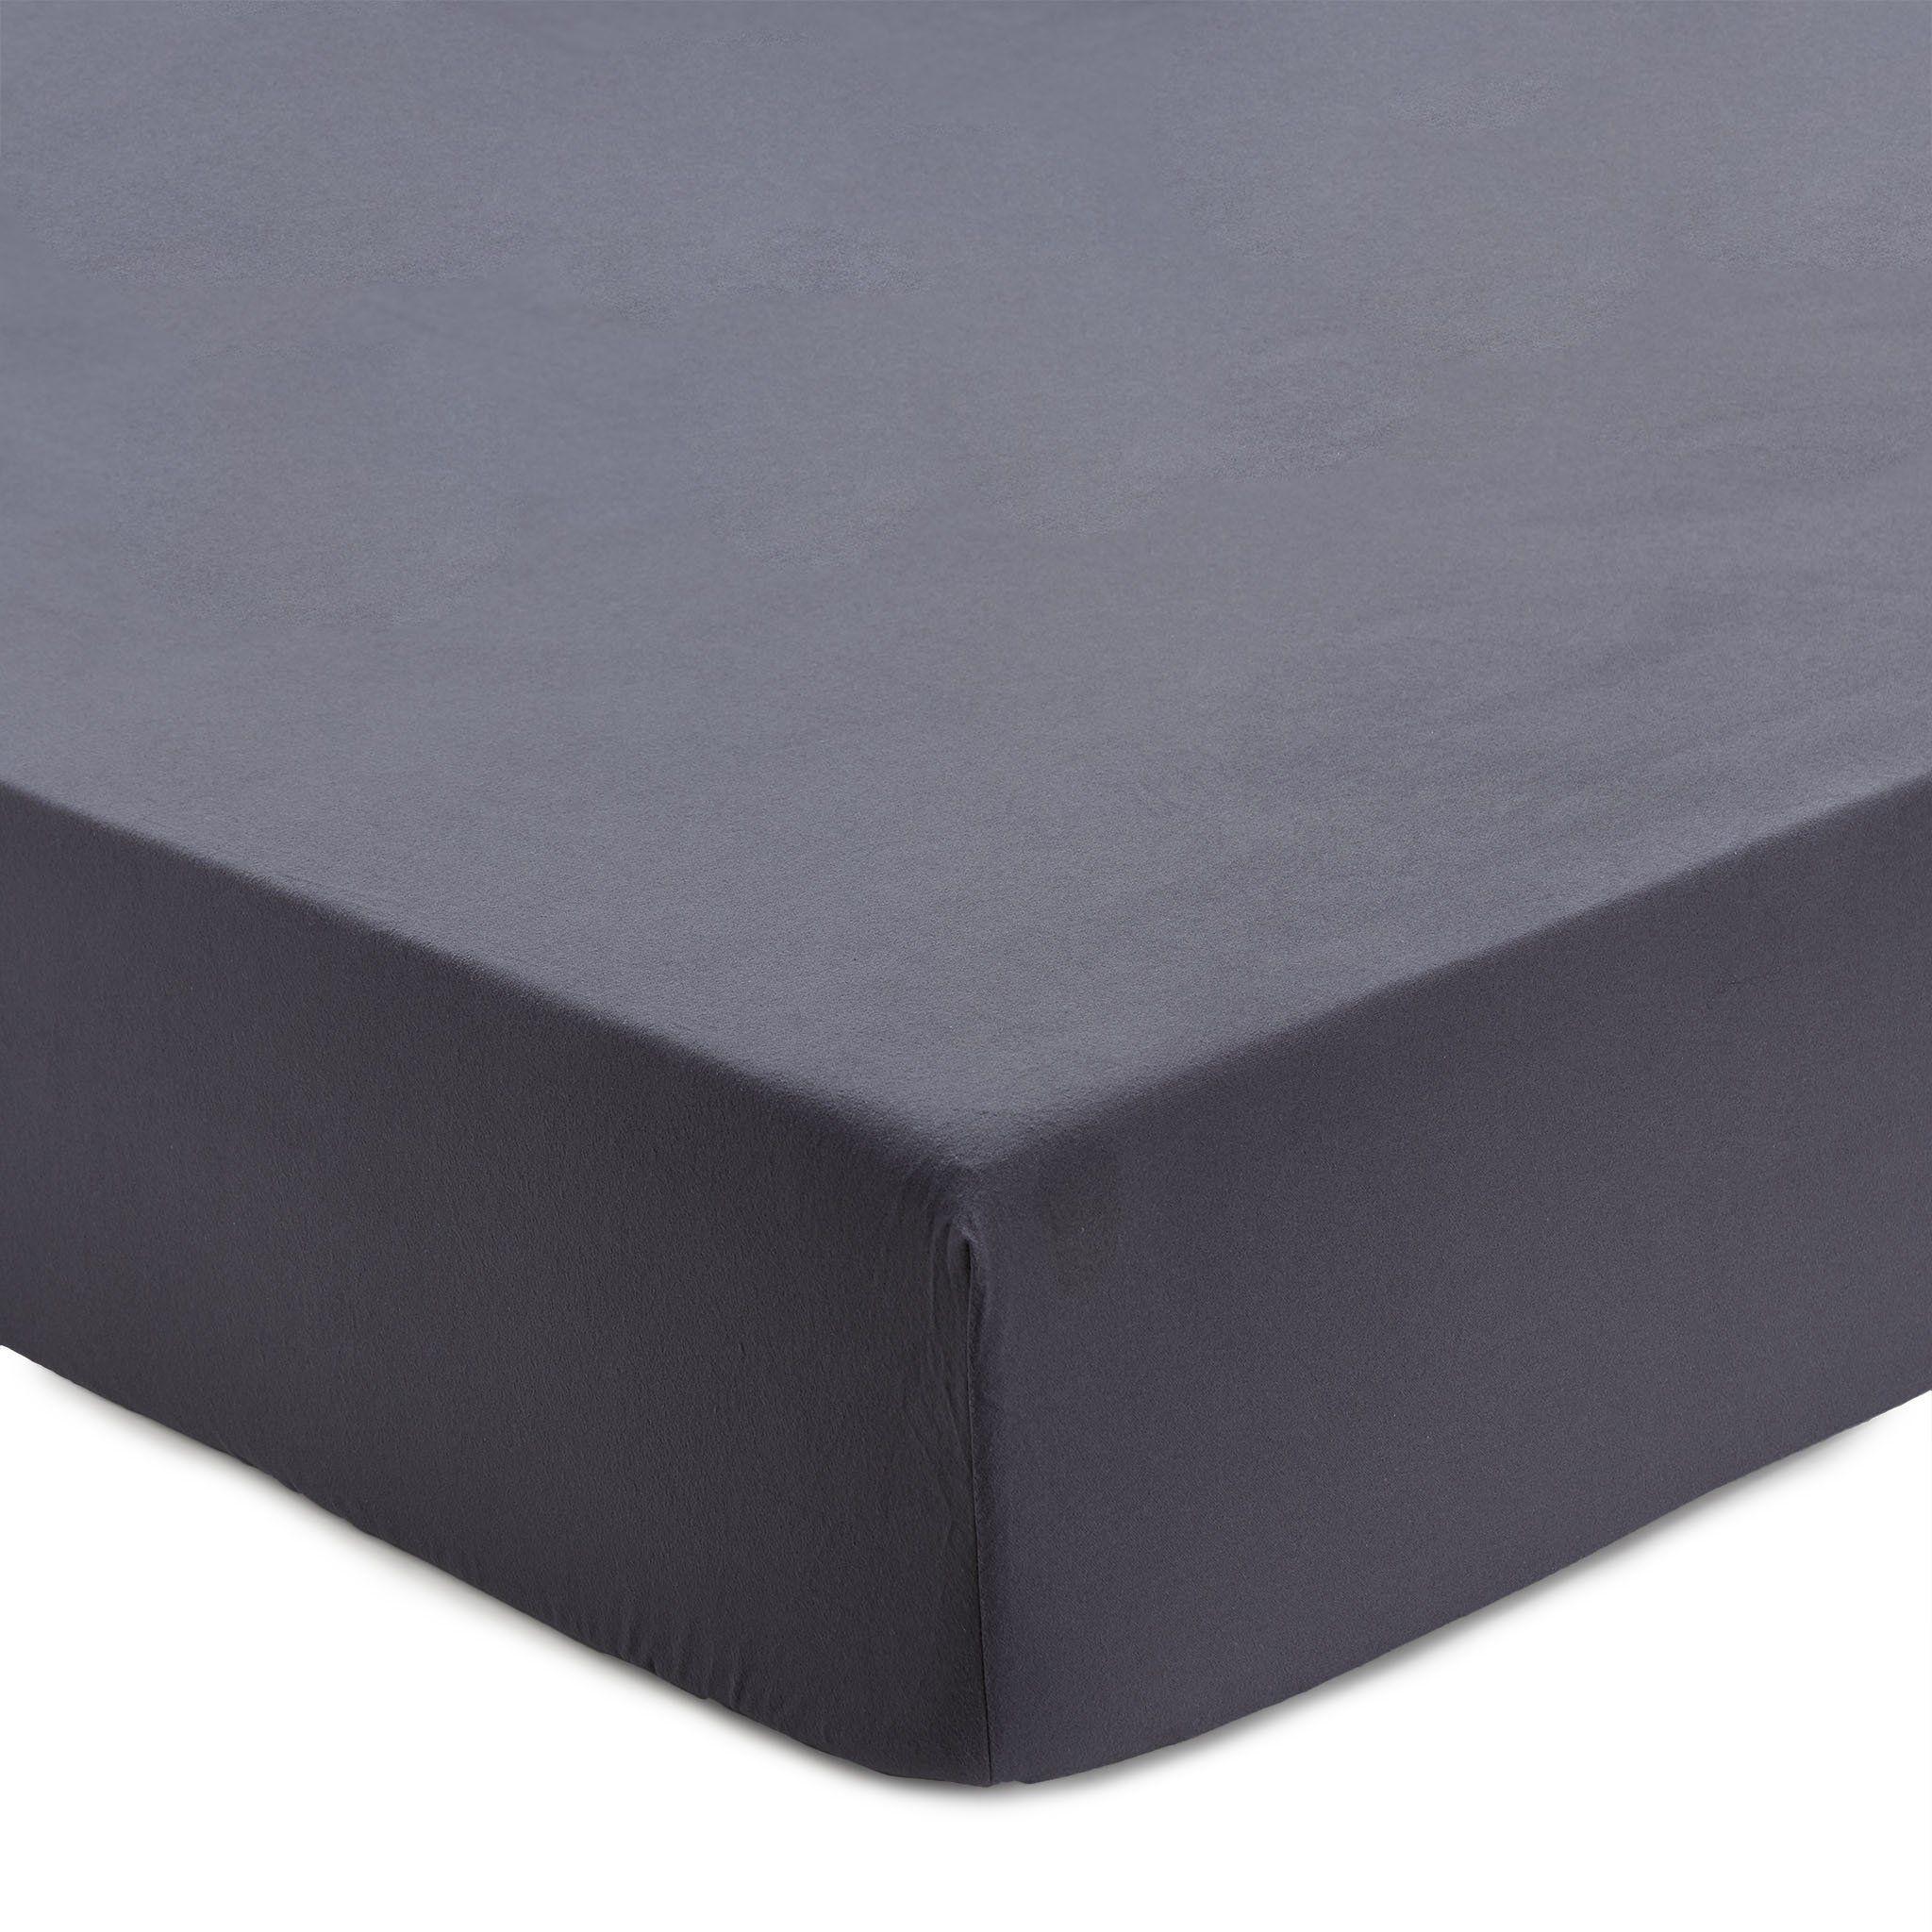 Flanell Spannbettlaken Montrose Grau 200x200 Cm Products In